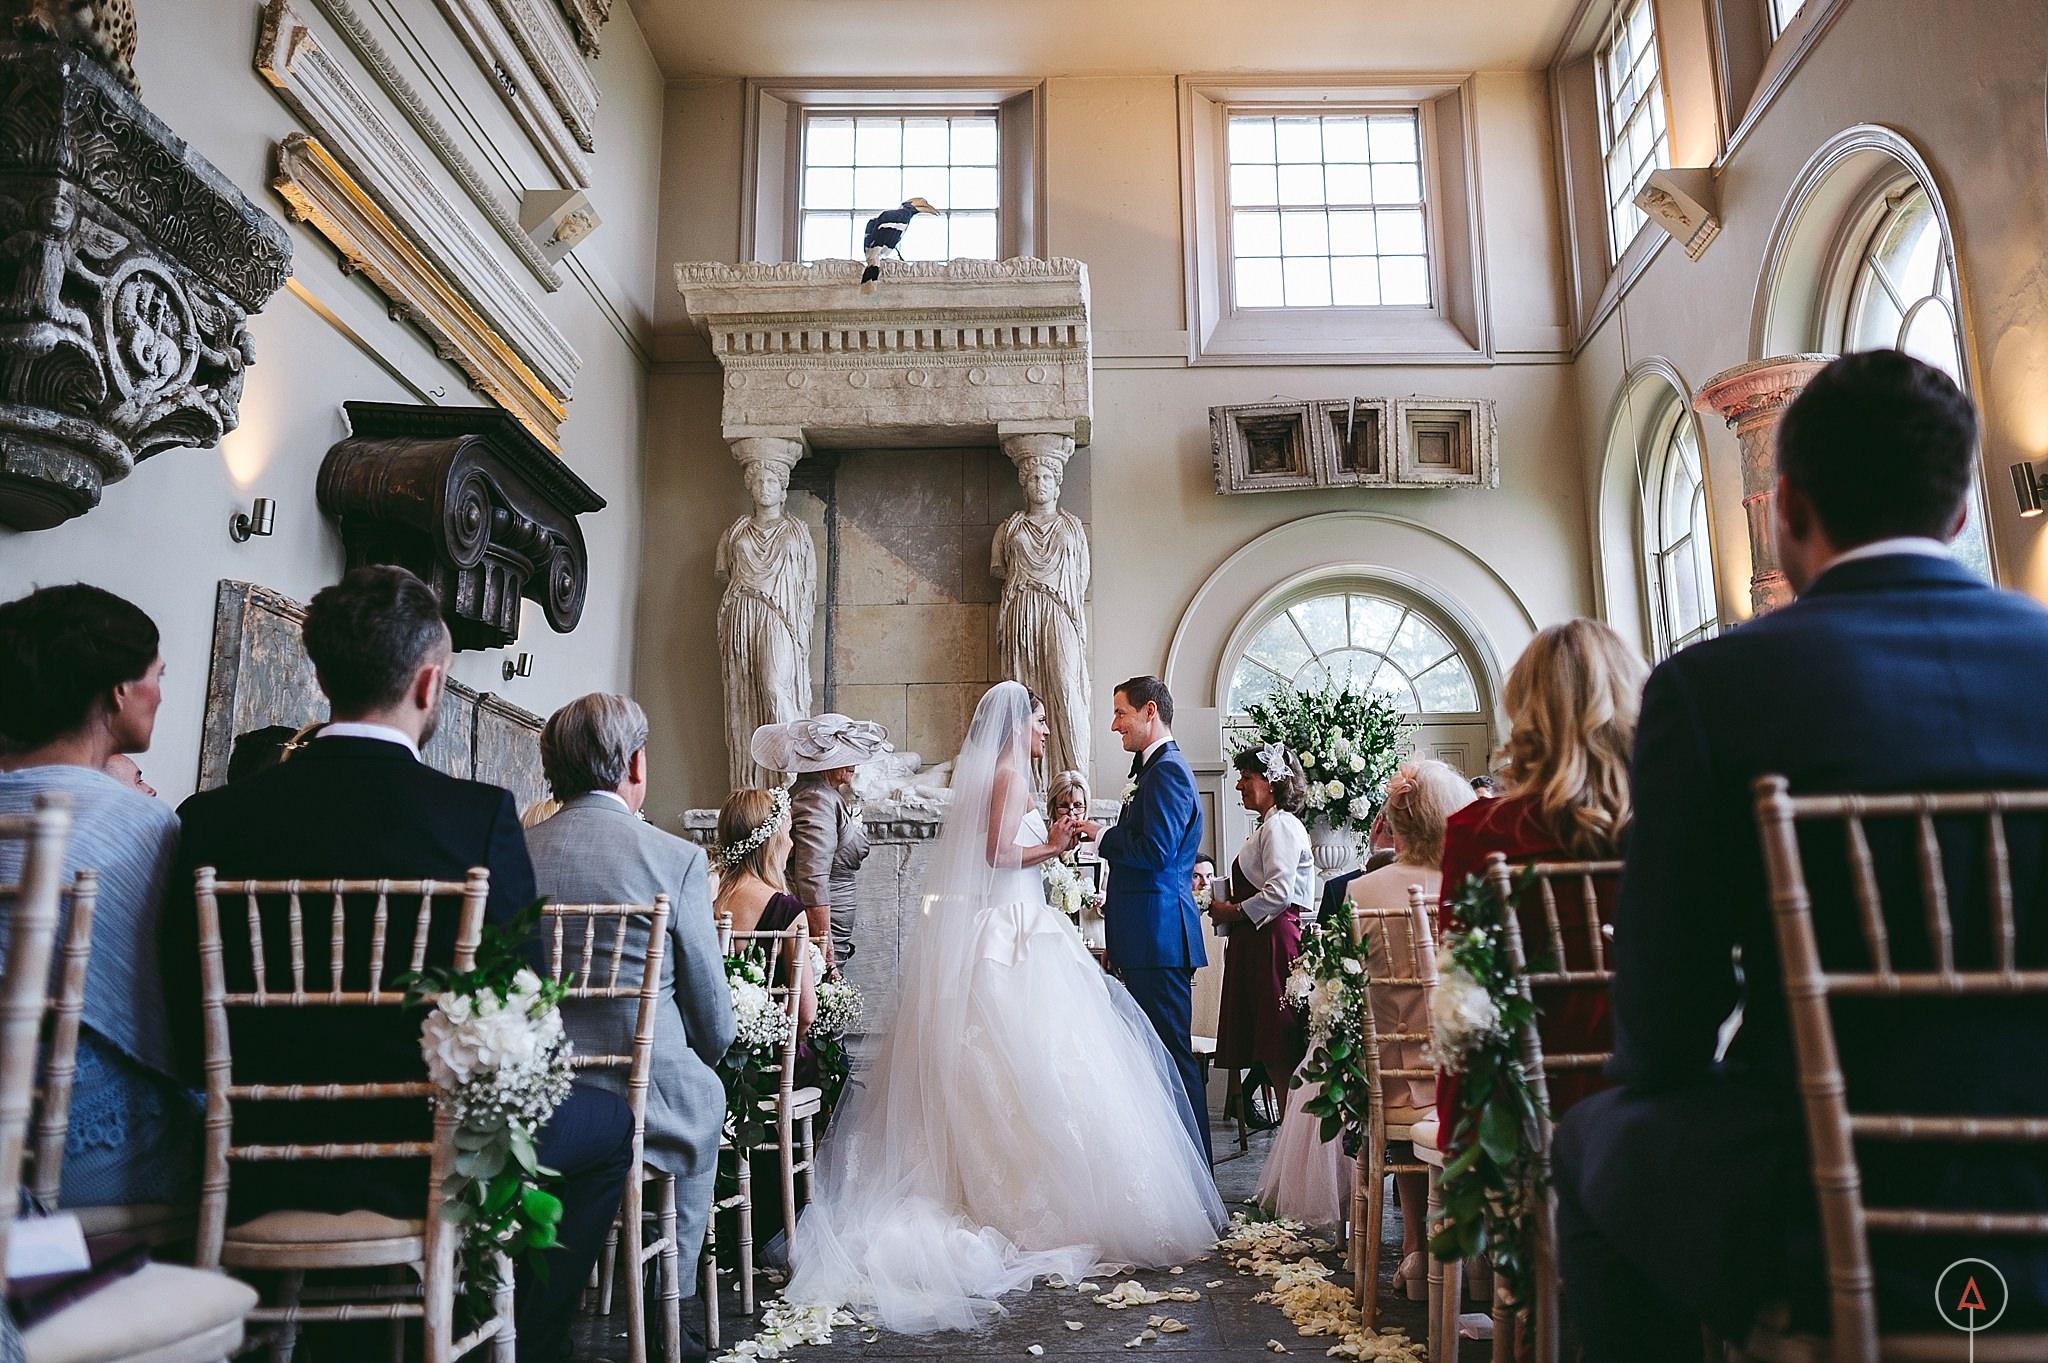 cardiff-wedding-photographer-aga-tomaszek_0255